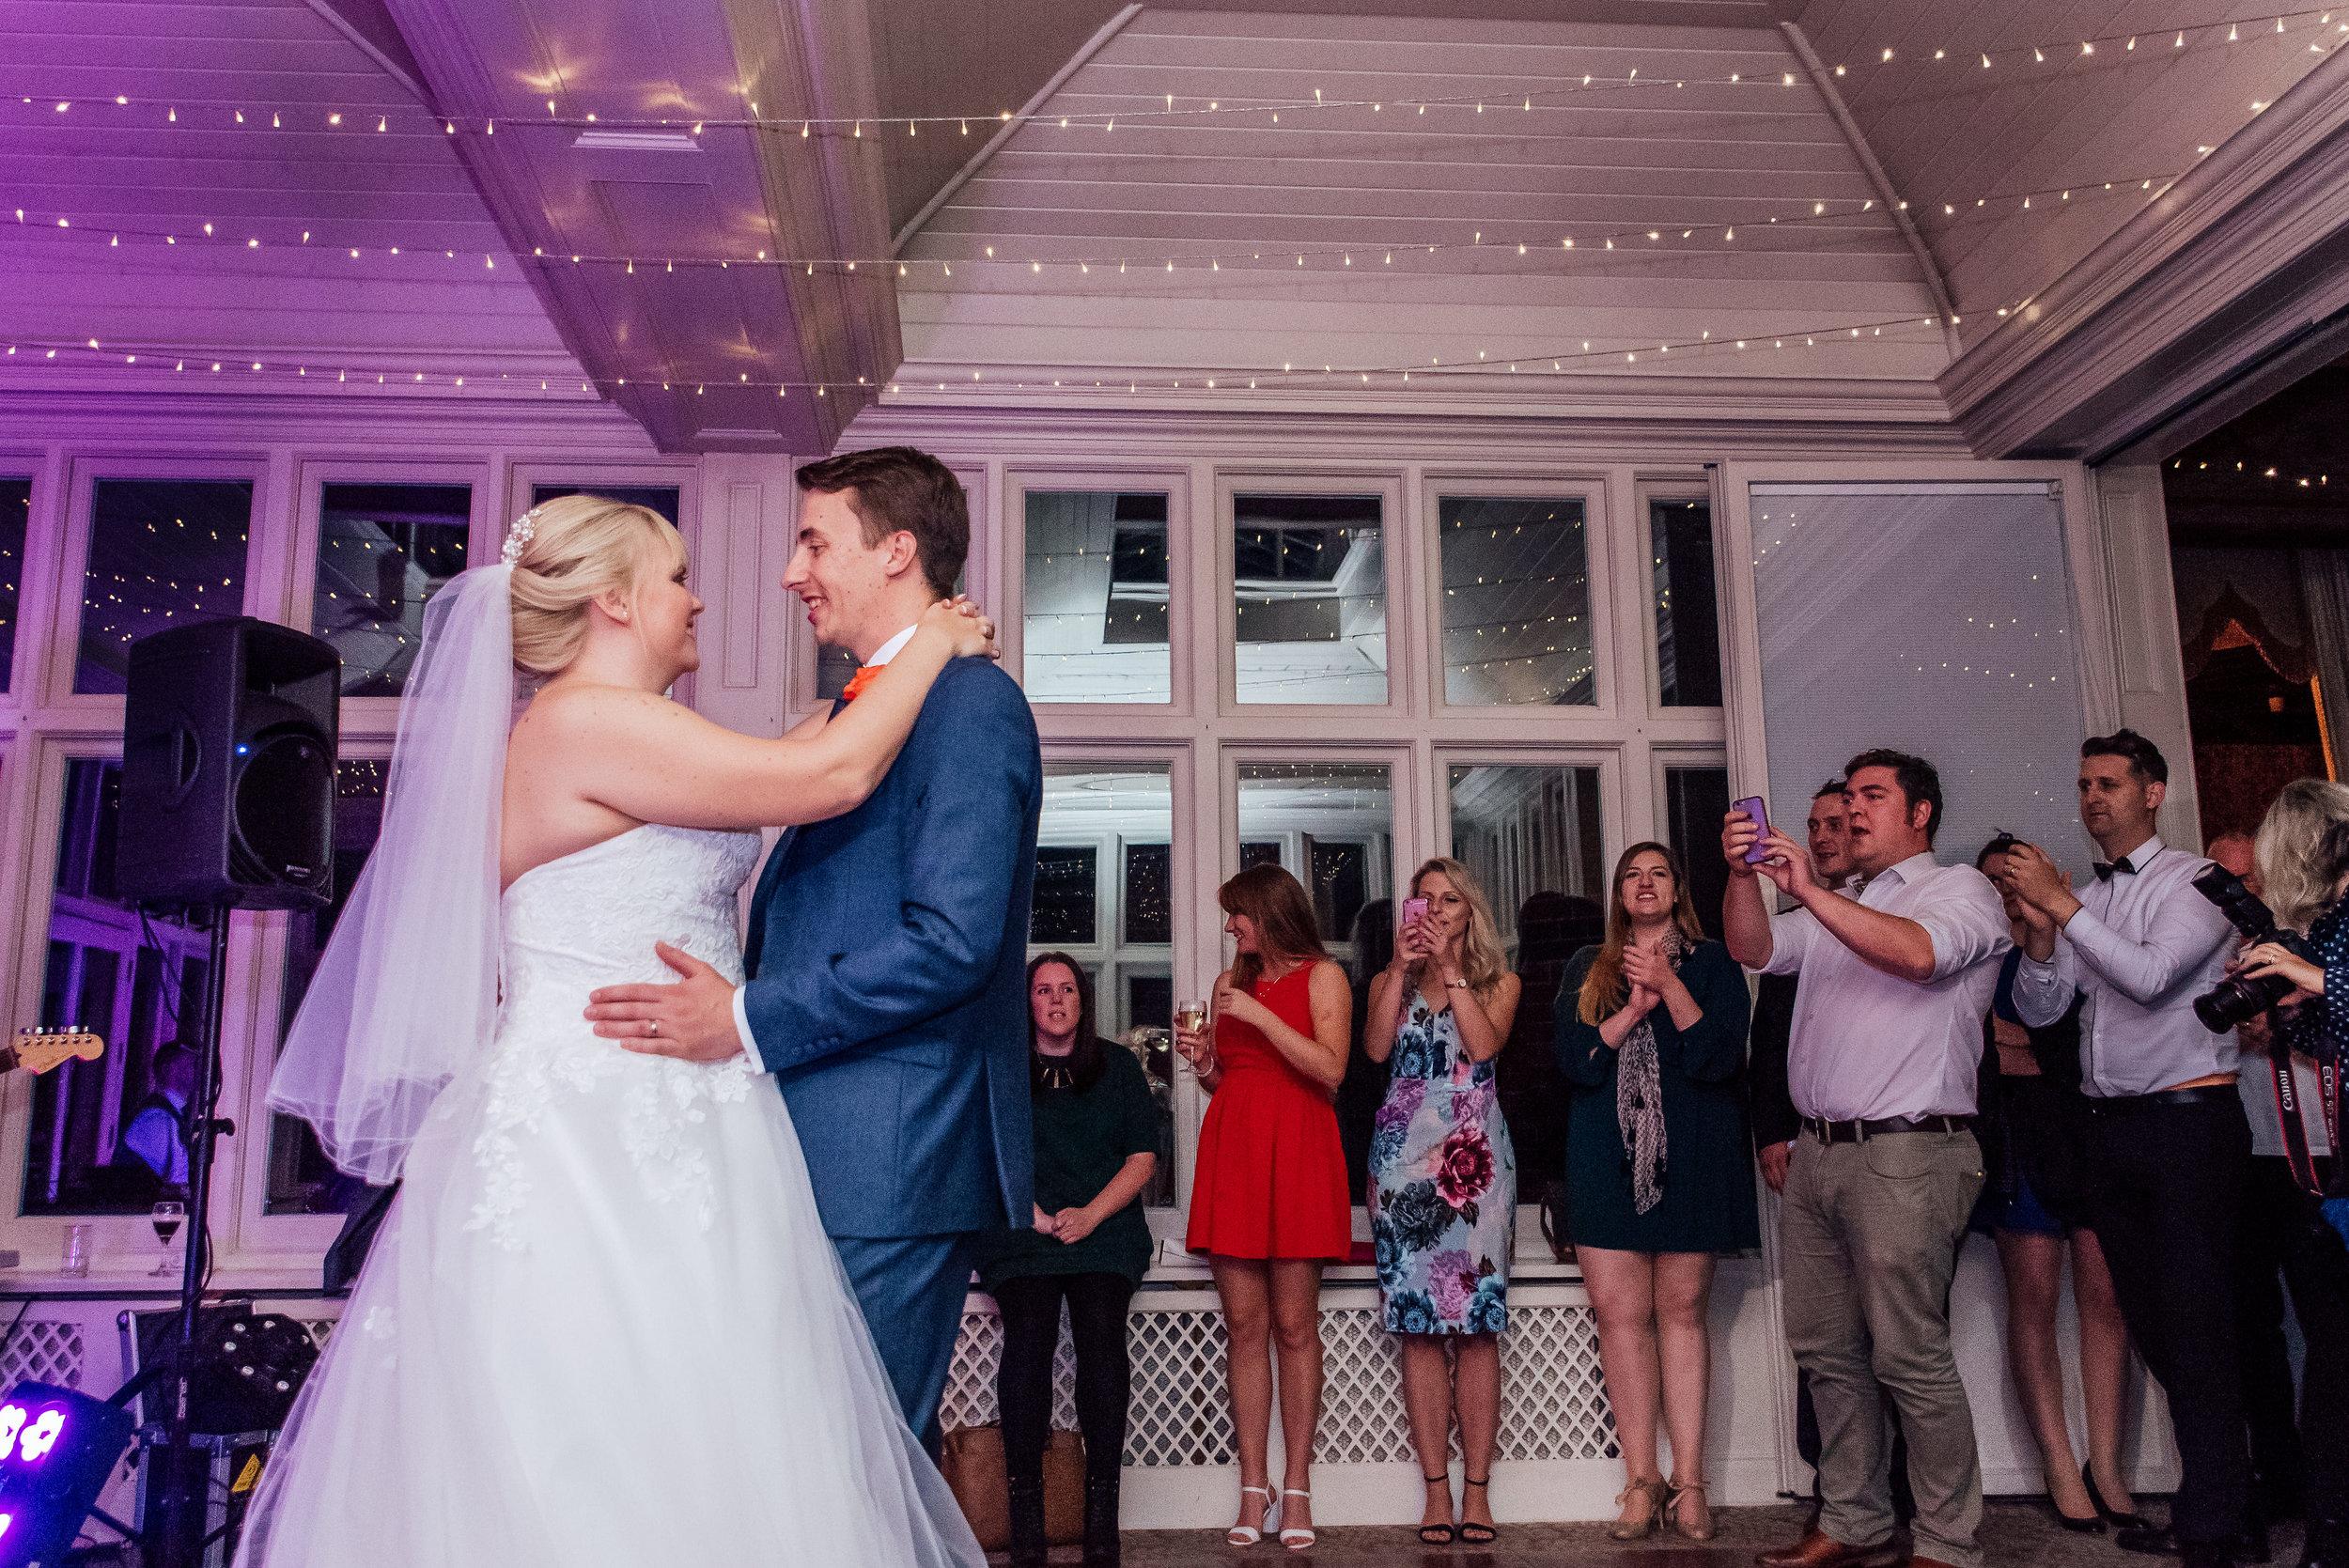 Bride and Groom fort dance - Elvetham Fleet Hampshire - Amy James photography - documentary wedding photographer Hampshire